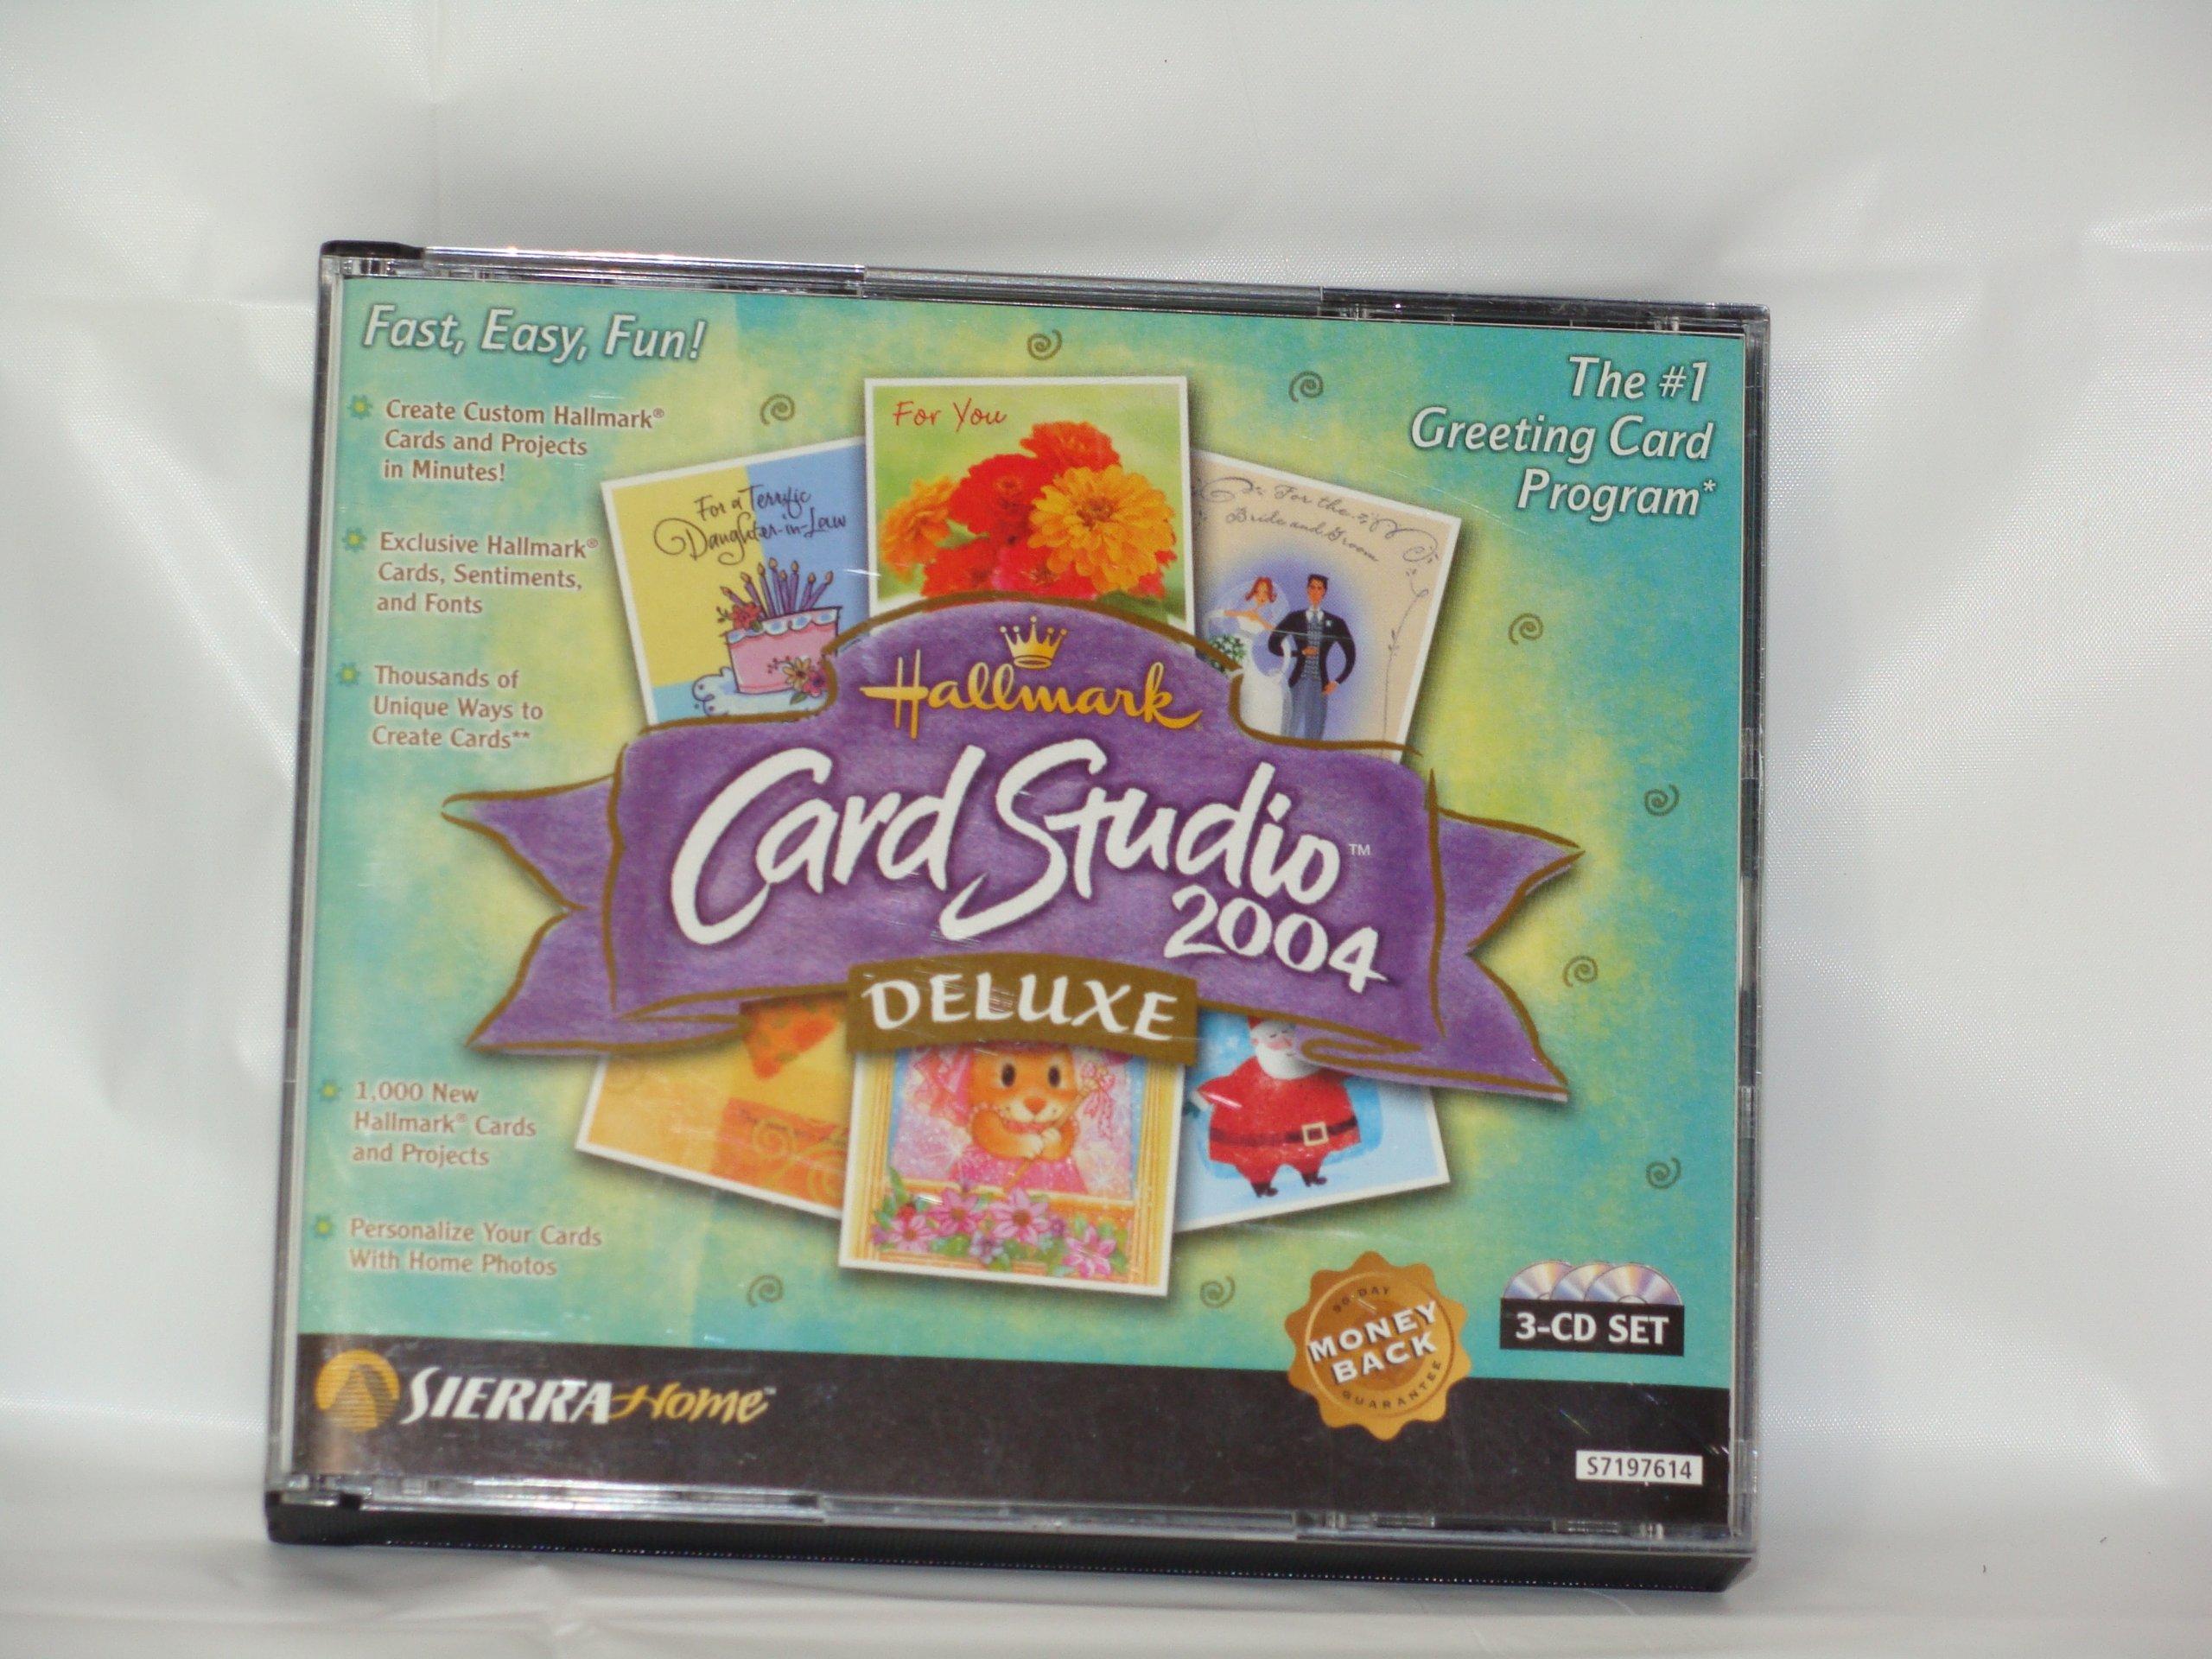 Hallmark Card Studio Deluxe 2004 - PC